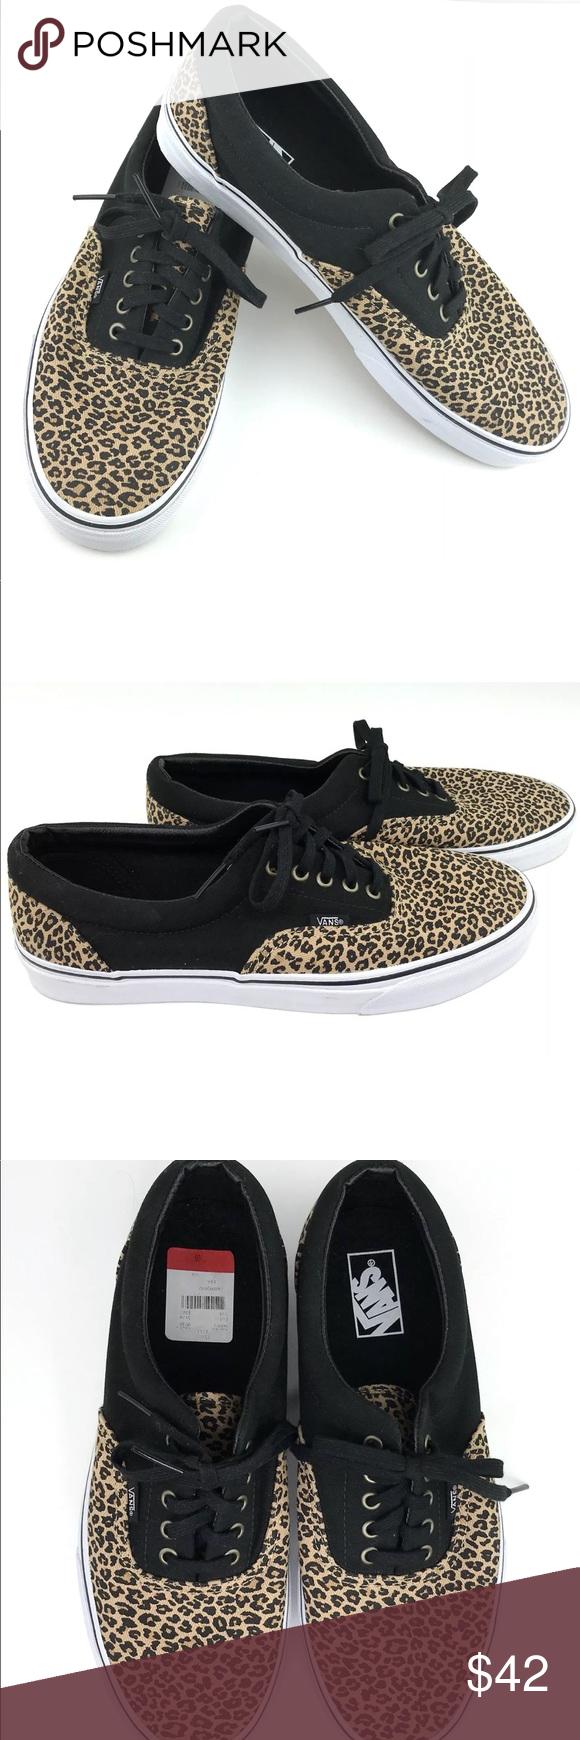 9df7f41e0adc60 Vans Era Men s 2 Tone Canvas Skate Board Shoes BRAND NEW WITHOUT BOX!! Vans  Era Men s 2 Tone Leopard Herringbone Canvas Skateboard Shoes US Size 11.5    EU ...